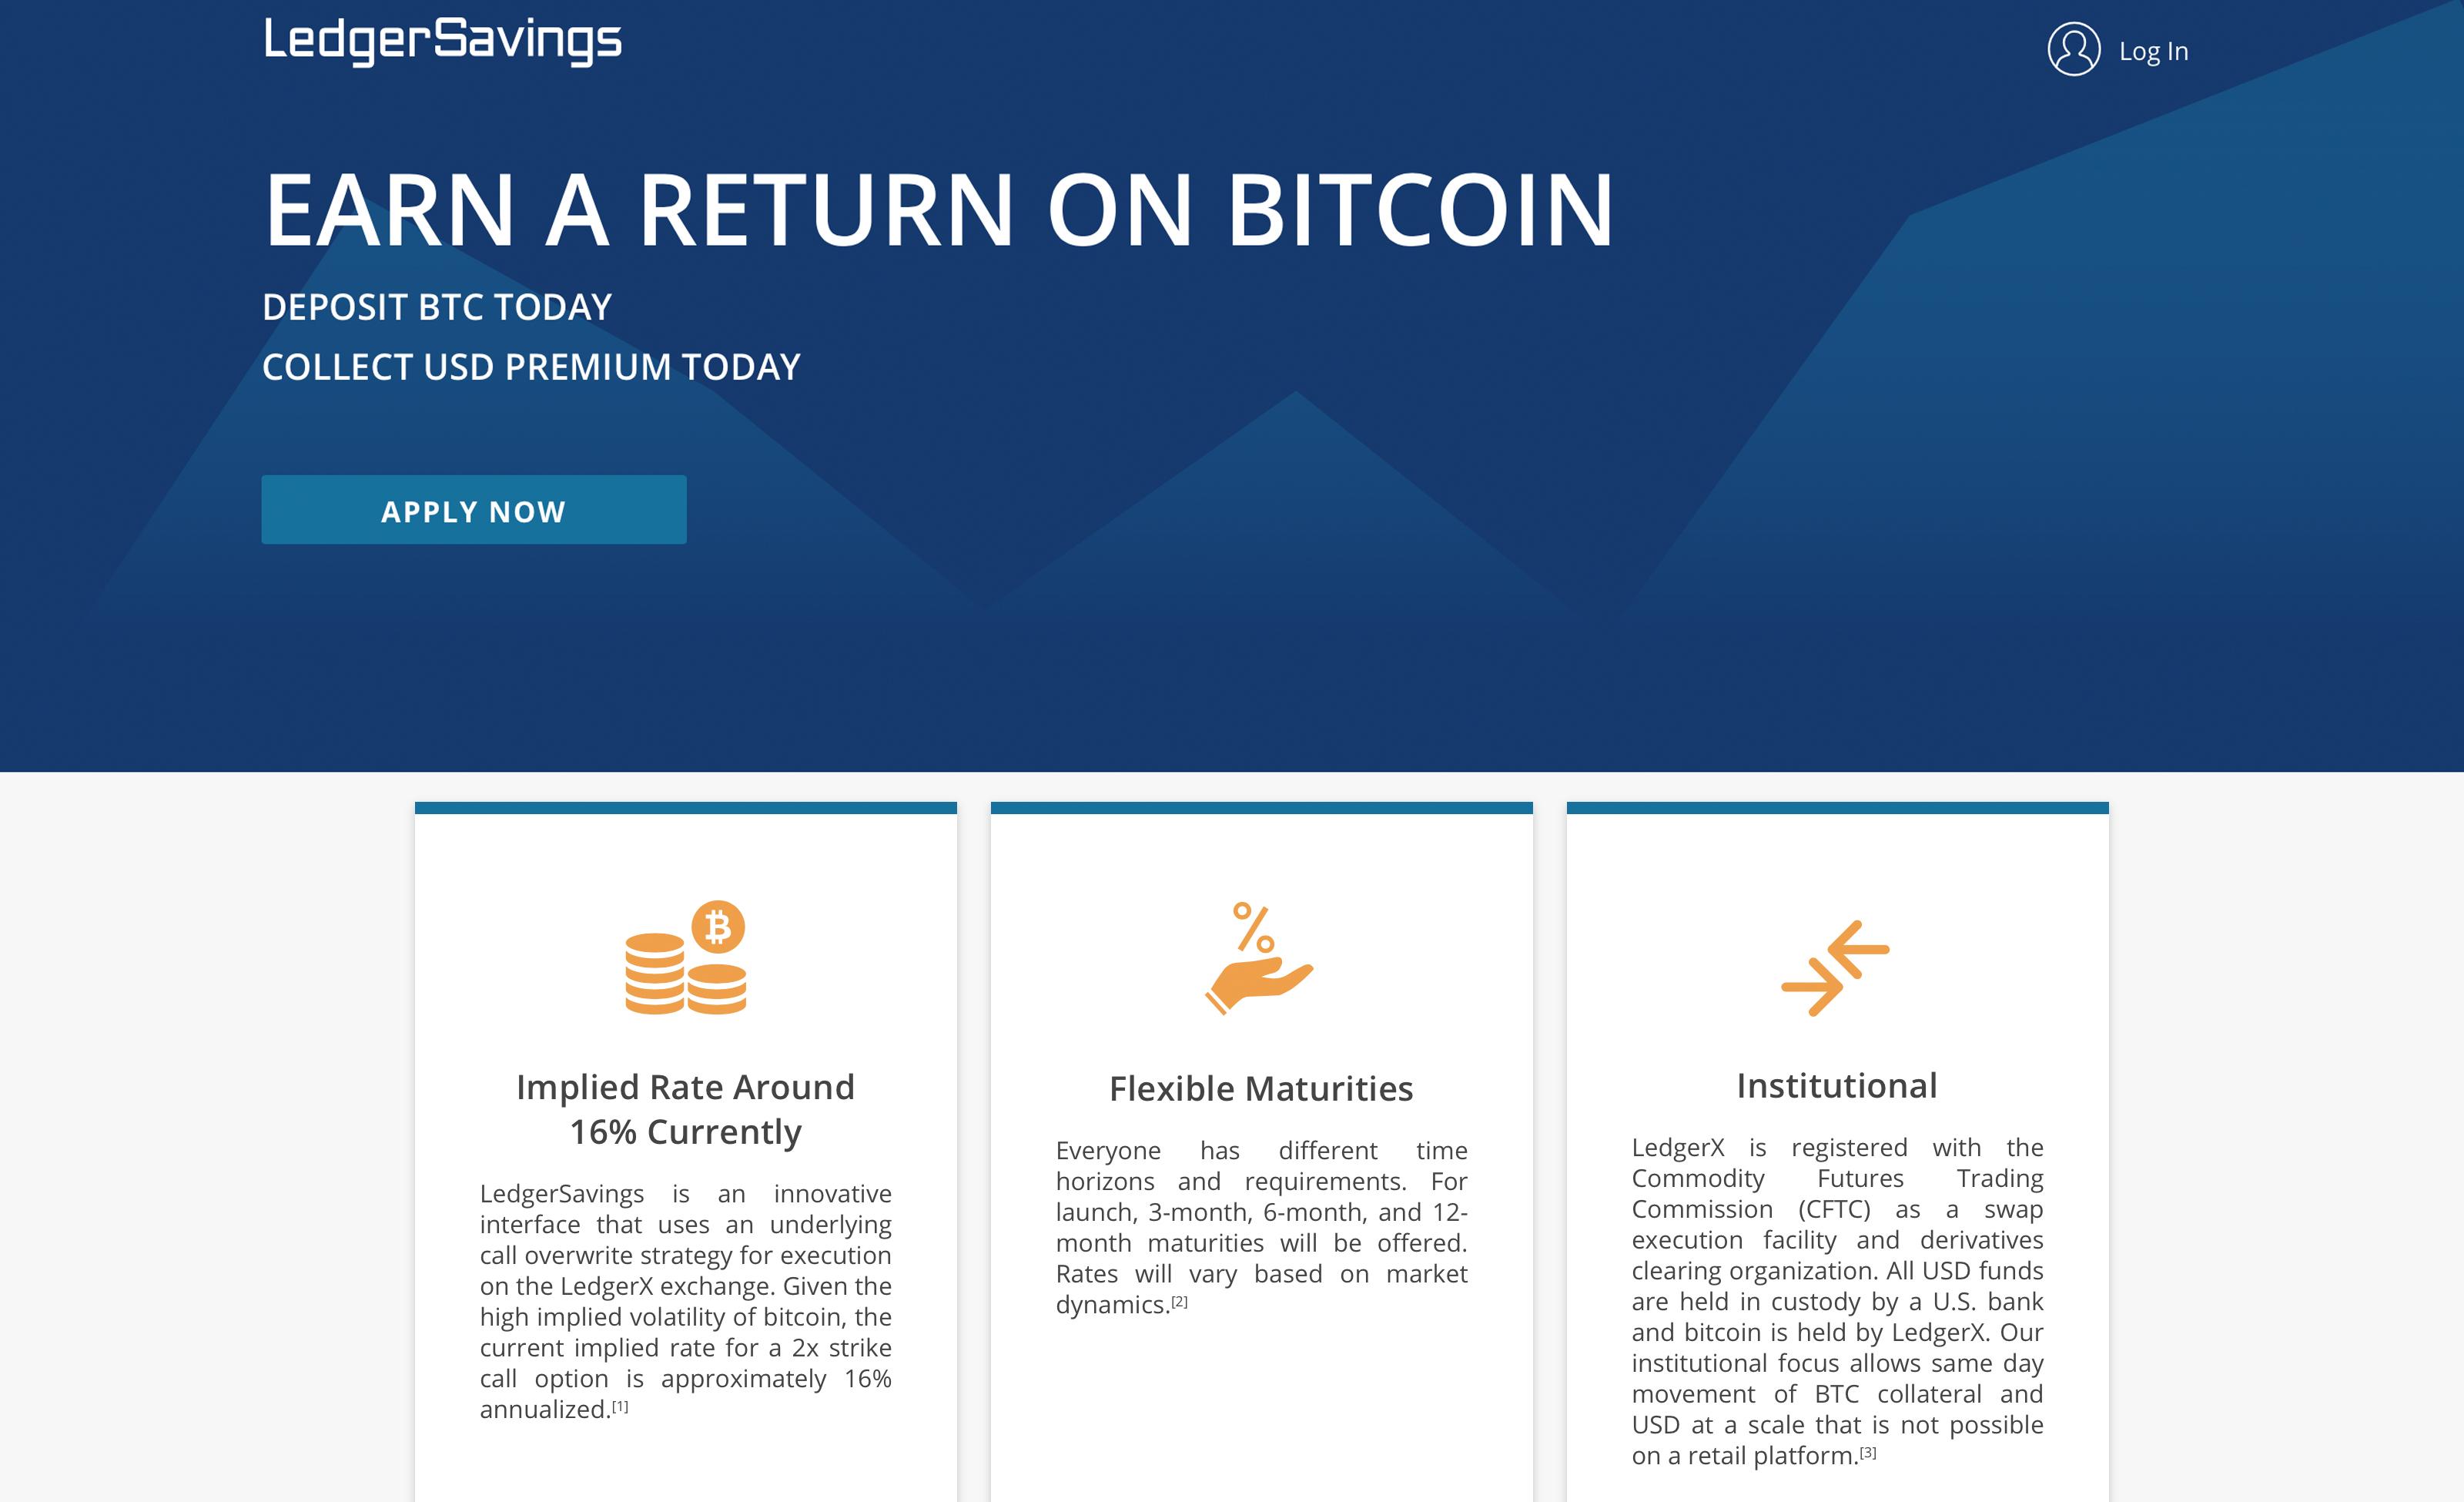 CFTC-Regulated Ledgerx Launches Interest-Bearing BTC Savings Platform